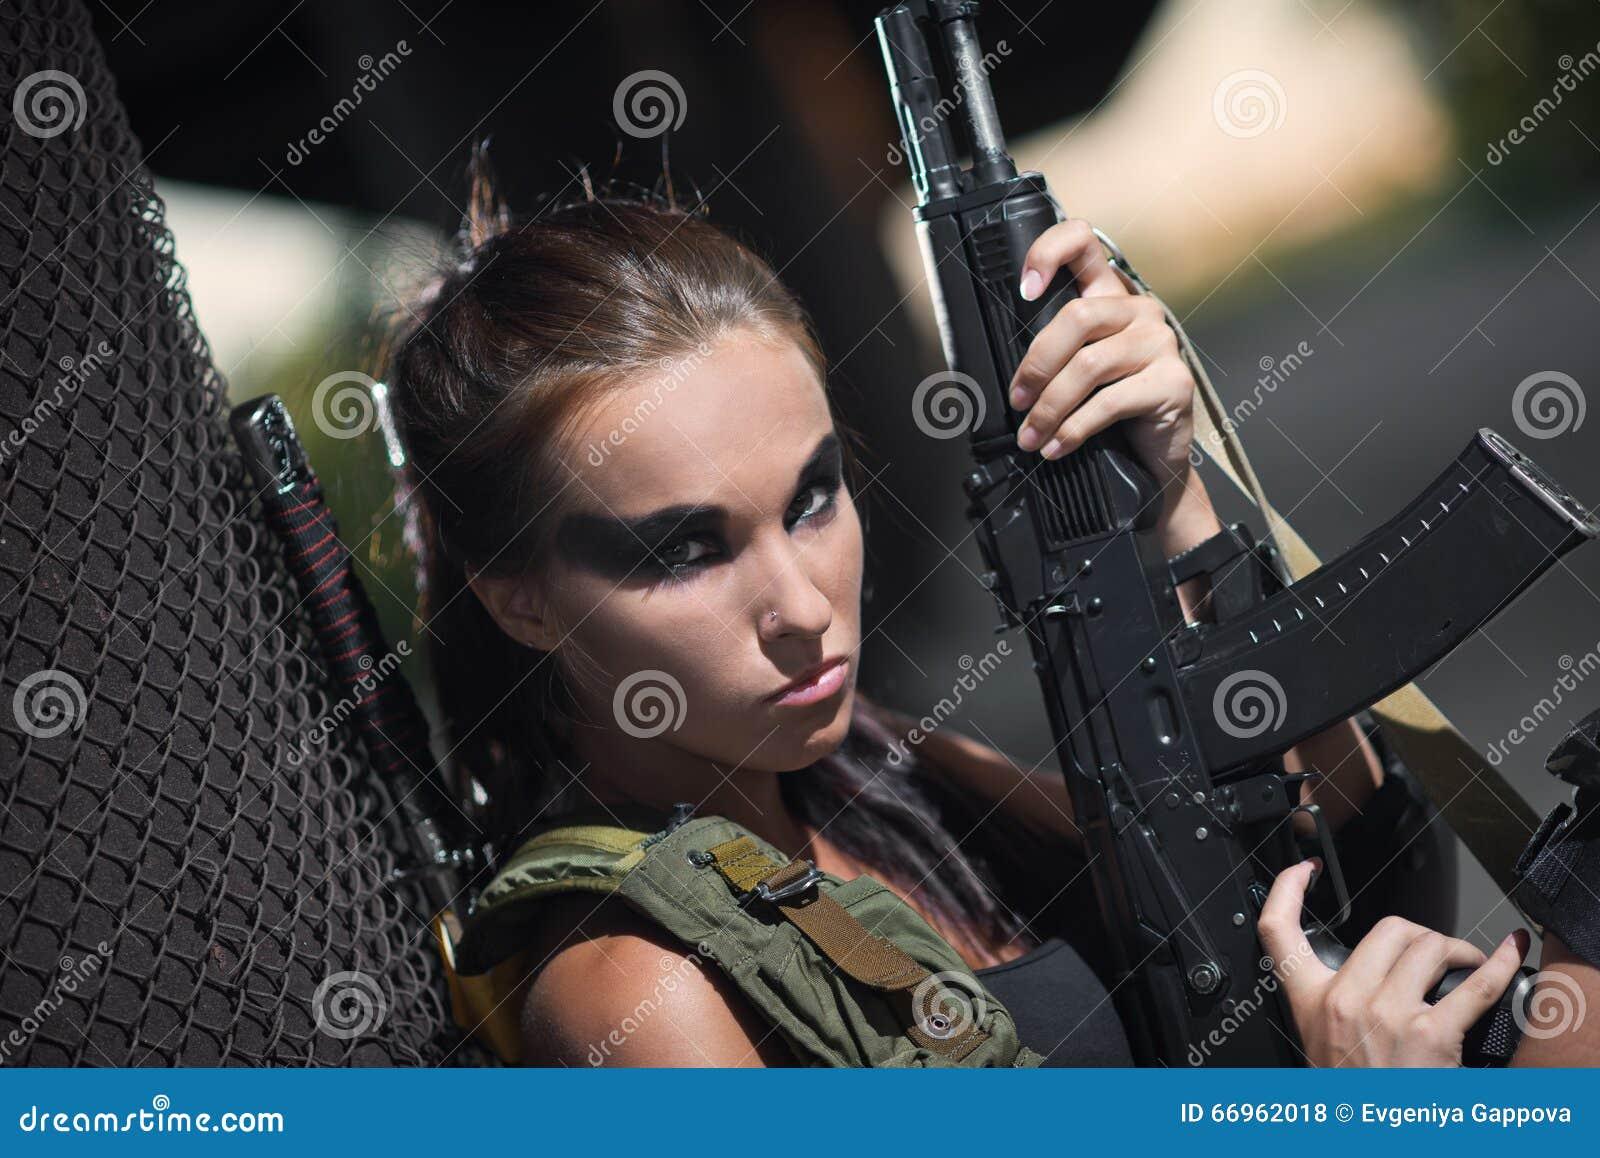 Sexy sniper game